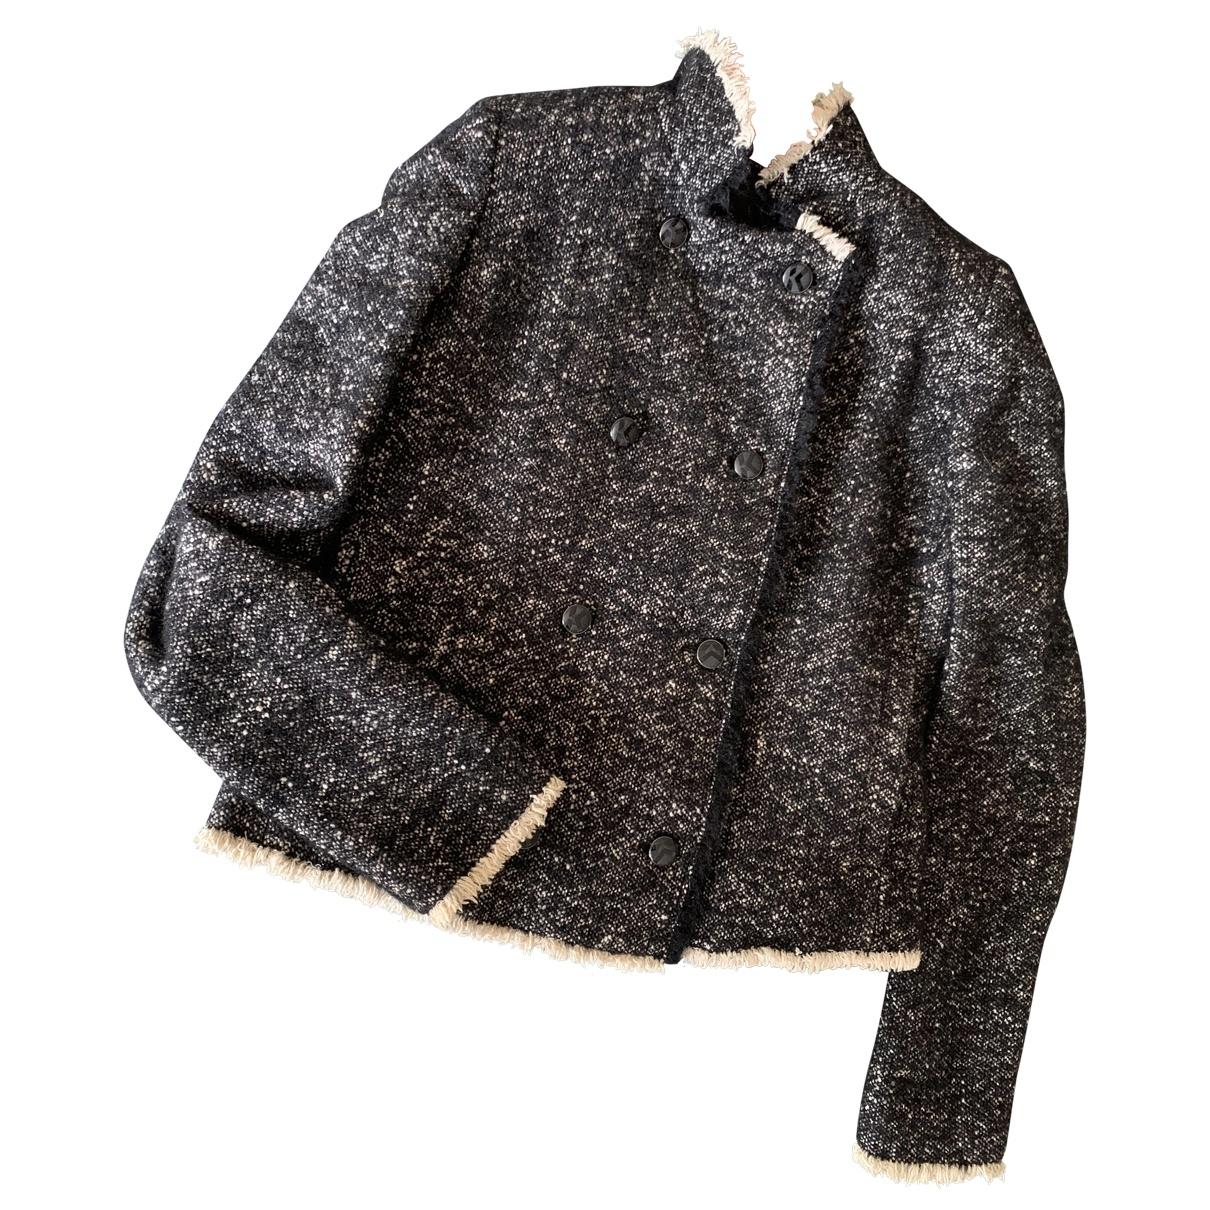 Karl Lagerfeld \N Black Wool jacket for Women 36 FR